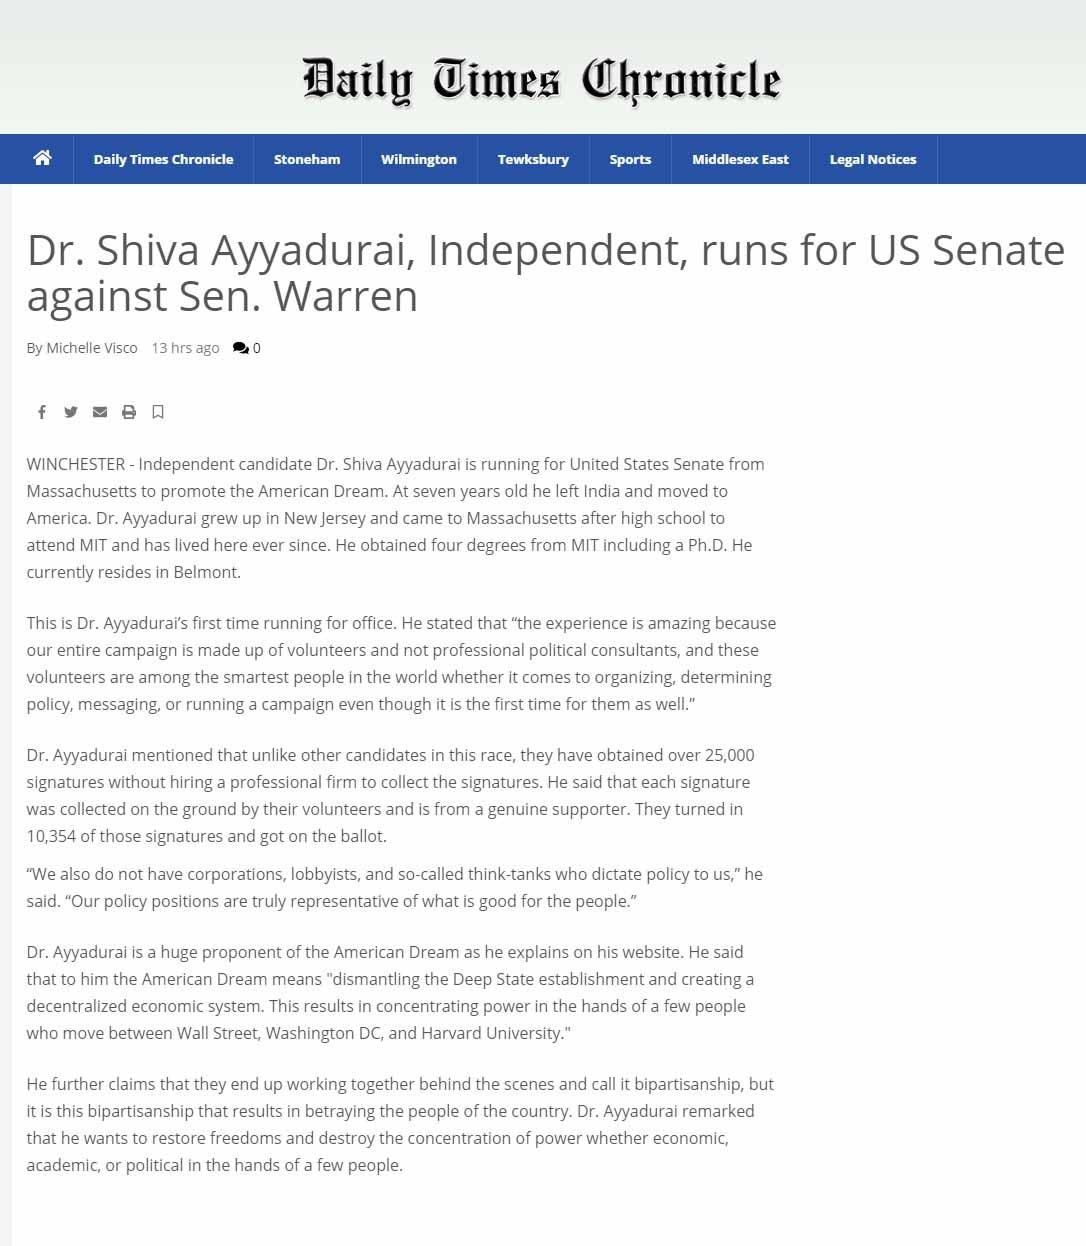 Dr. Shiva Ayyadurai, Independent, Runs For US Senate Against Sen. Warren